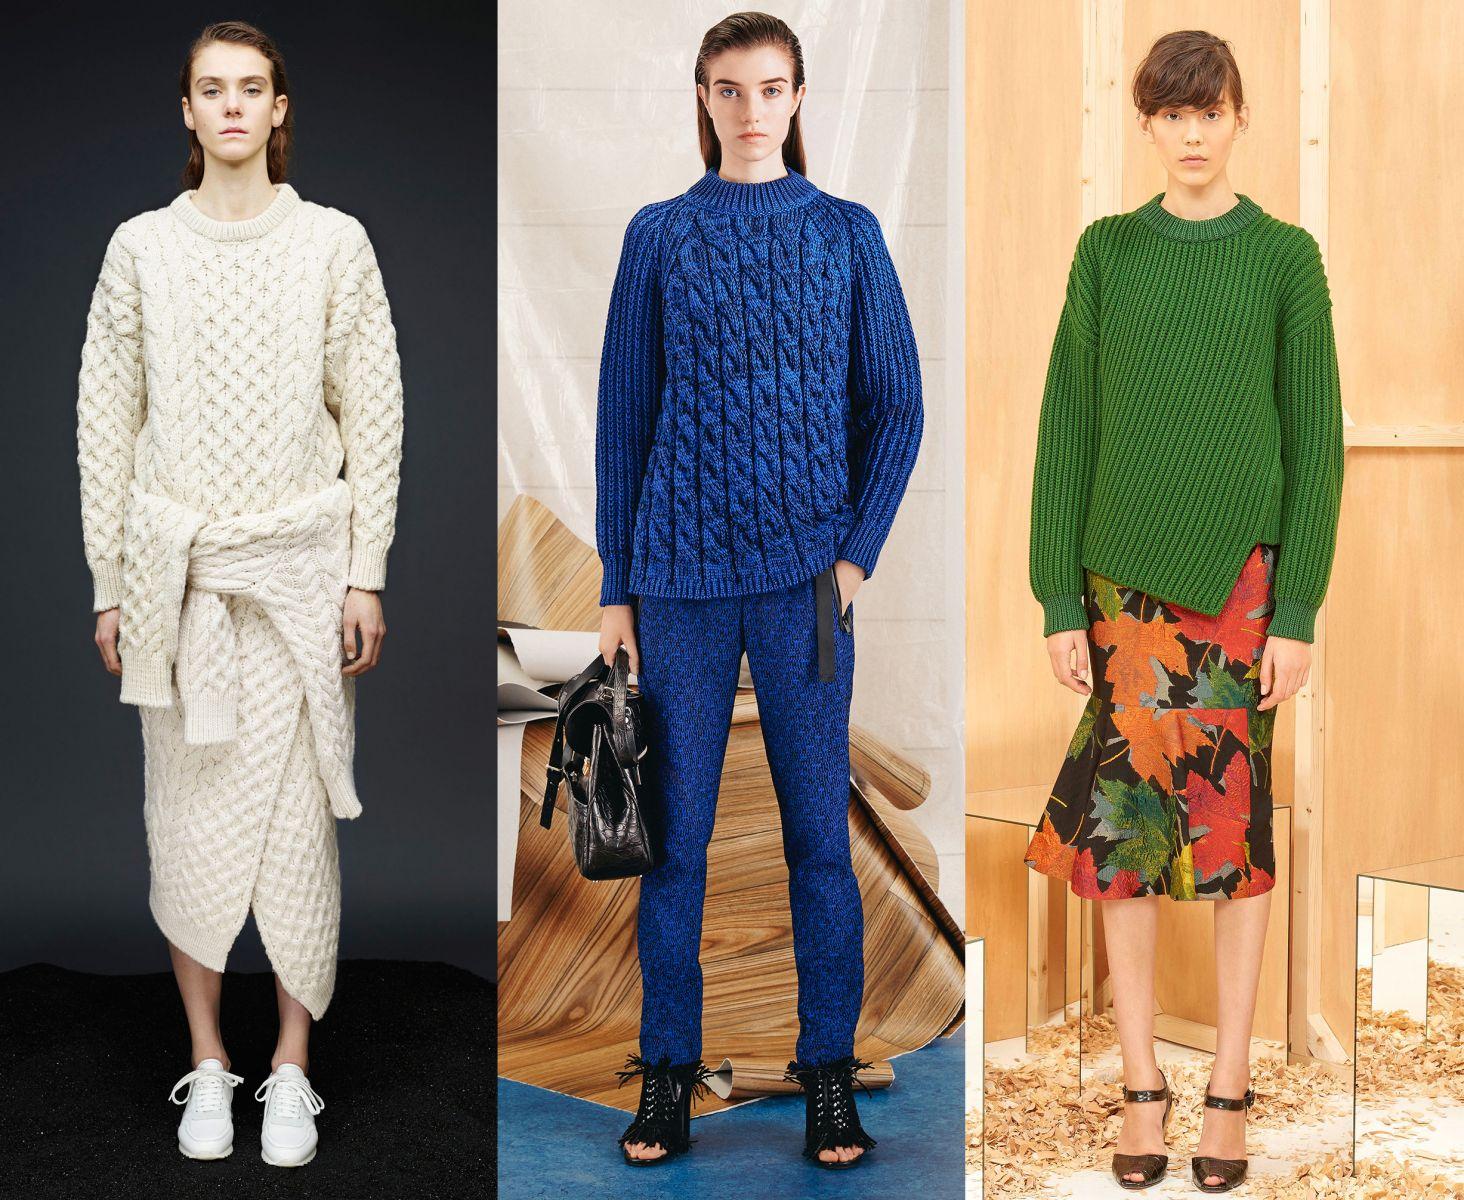 Что носить в 2015 году: тенденции pre-fall - фото №7